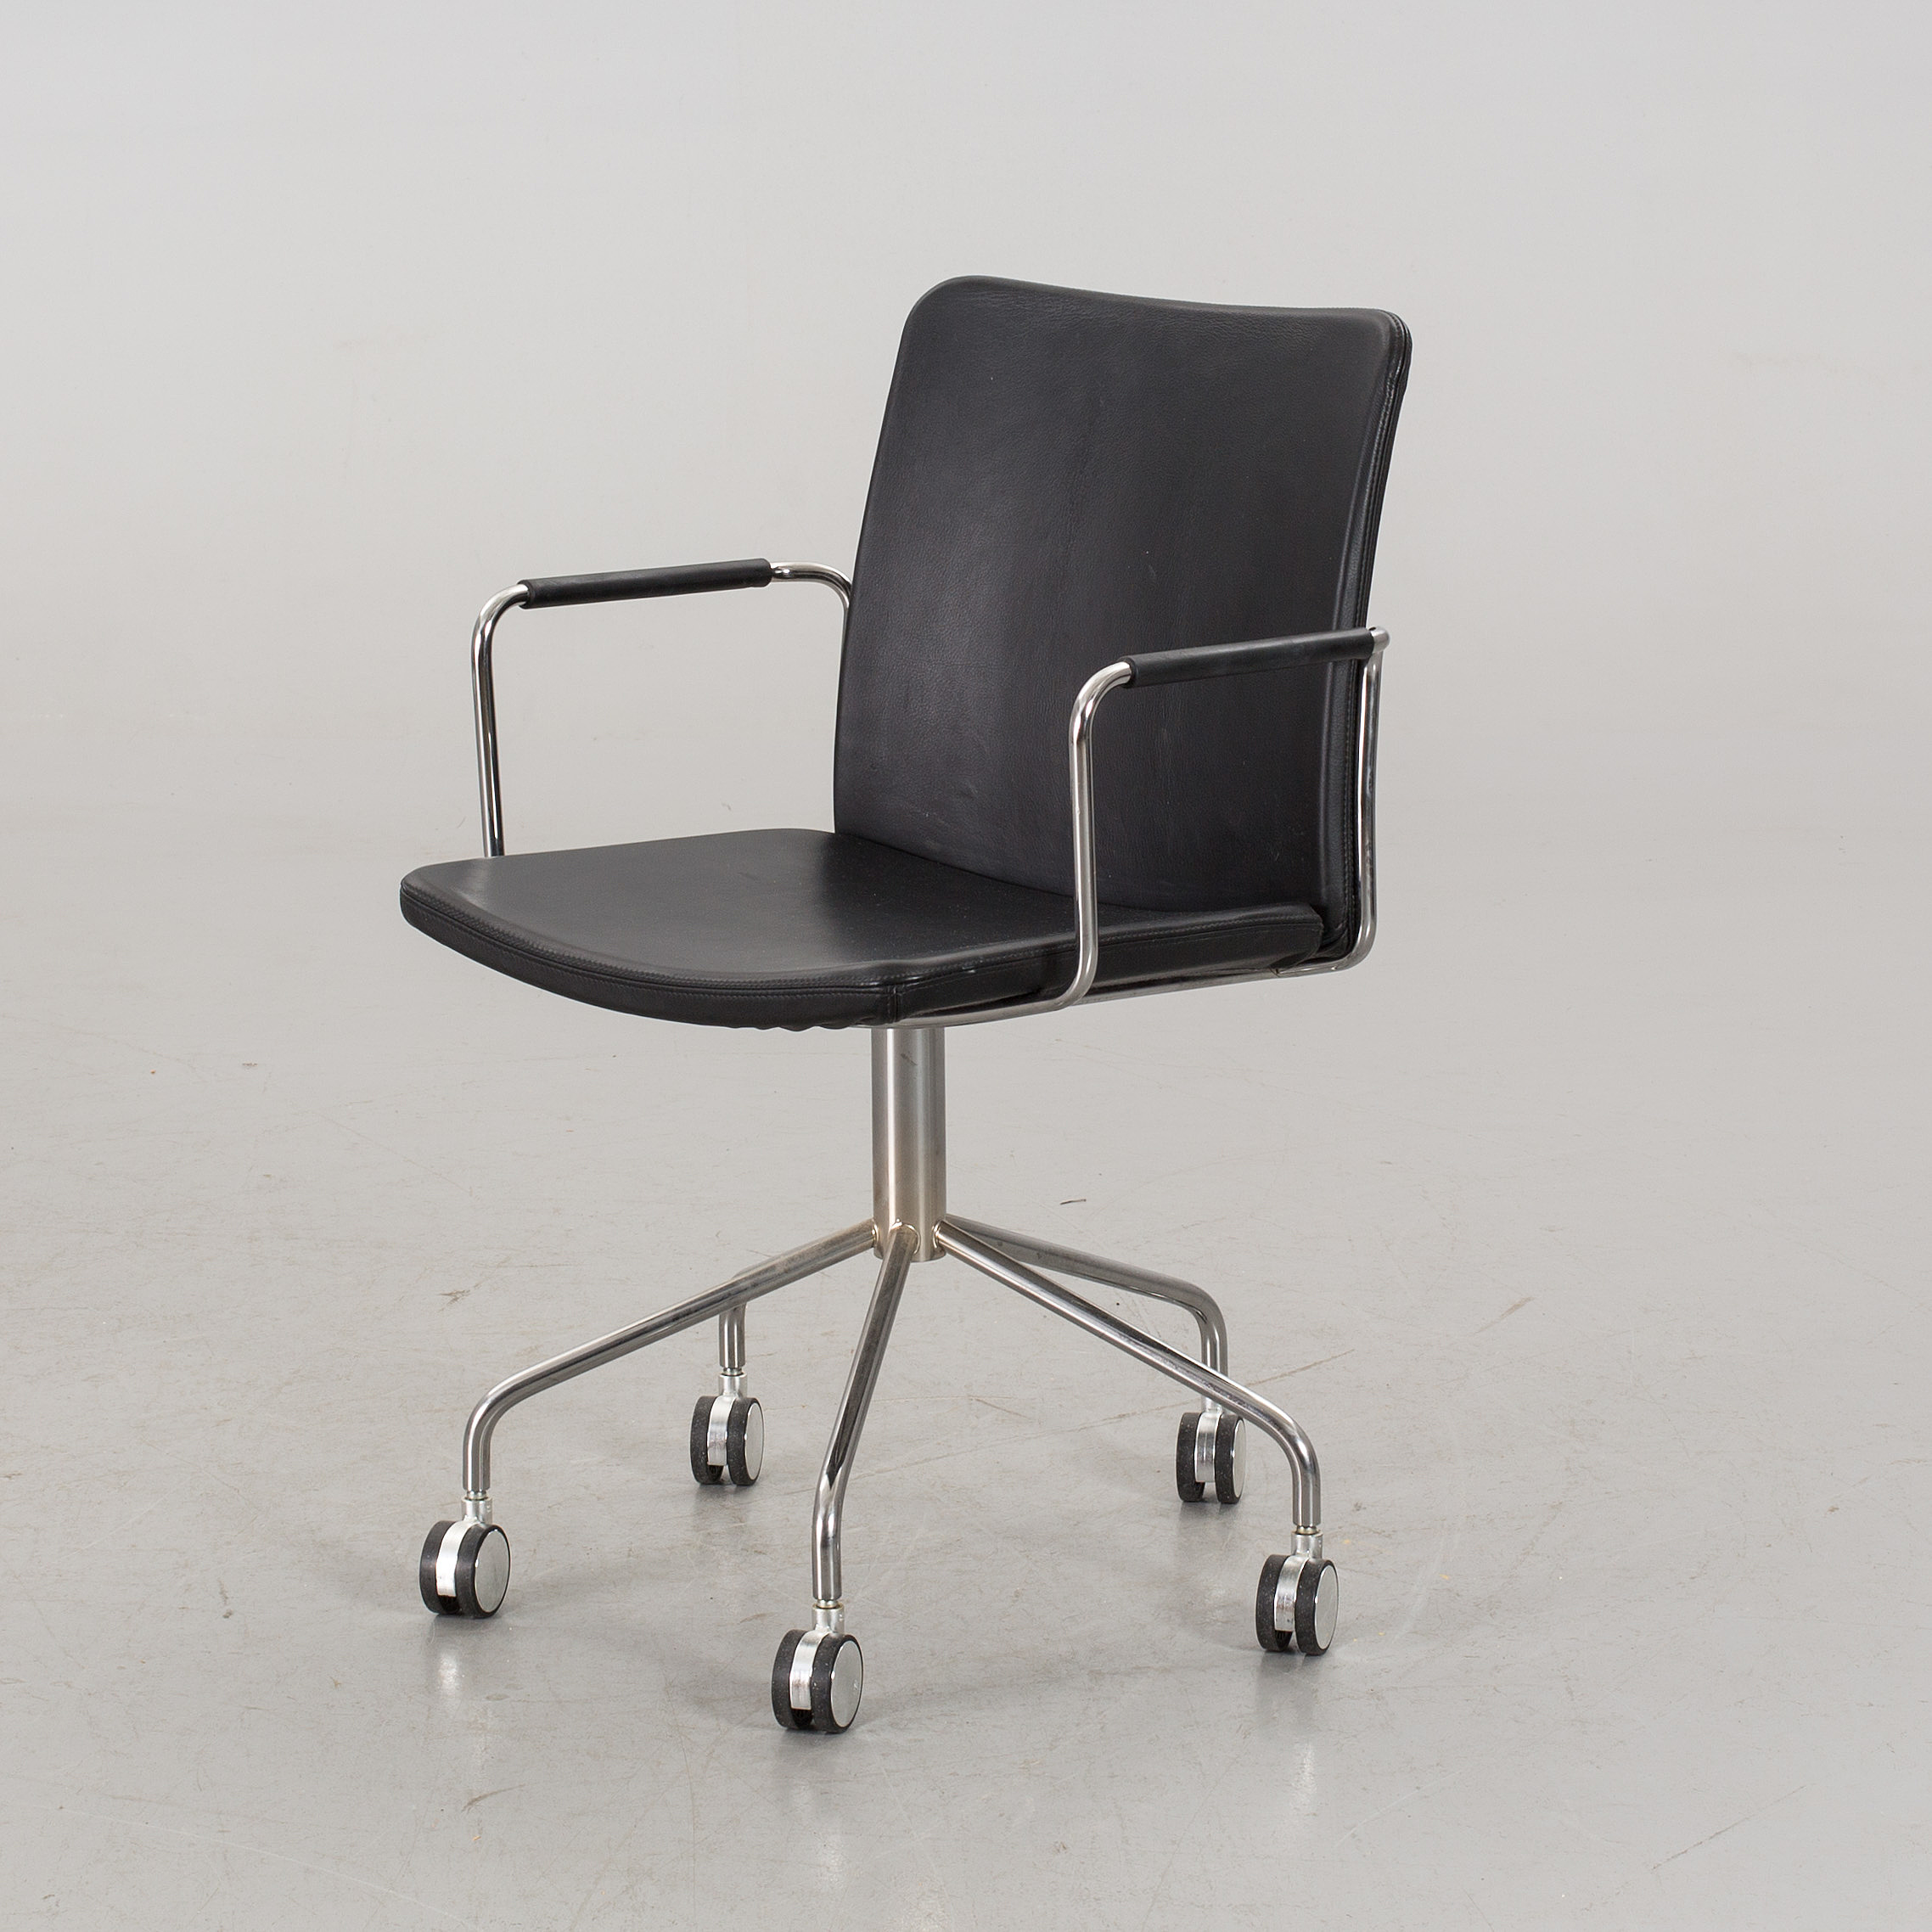 "BROBERG& RIDDERSTRåLE kontorsstol""Stella"" för Swedese 2000 tal Bukowskis"